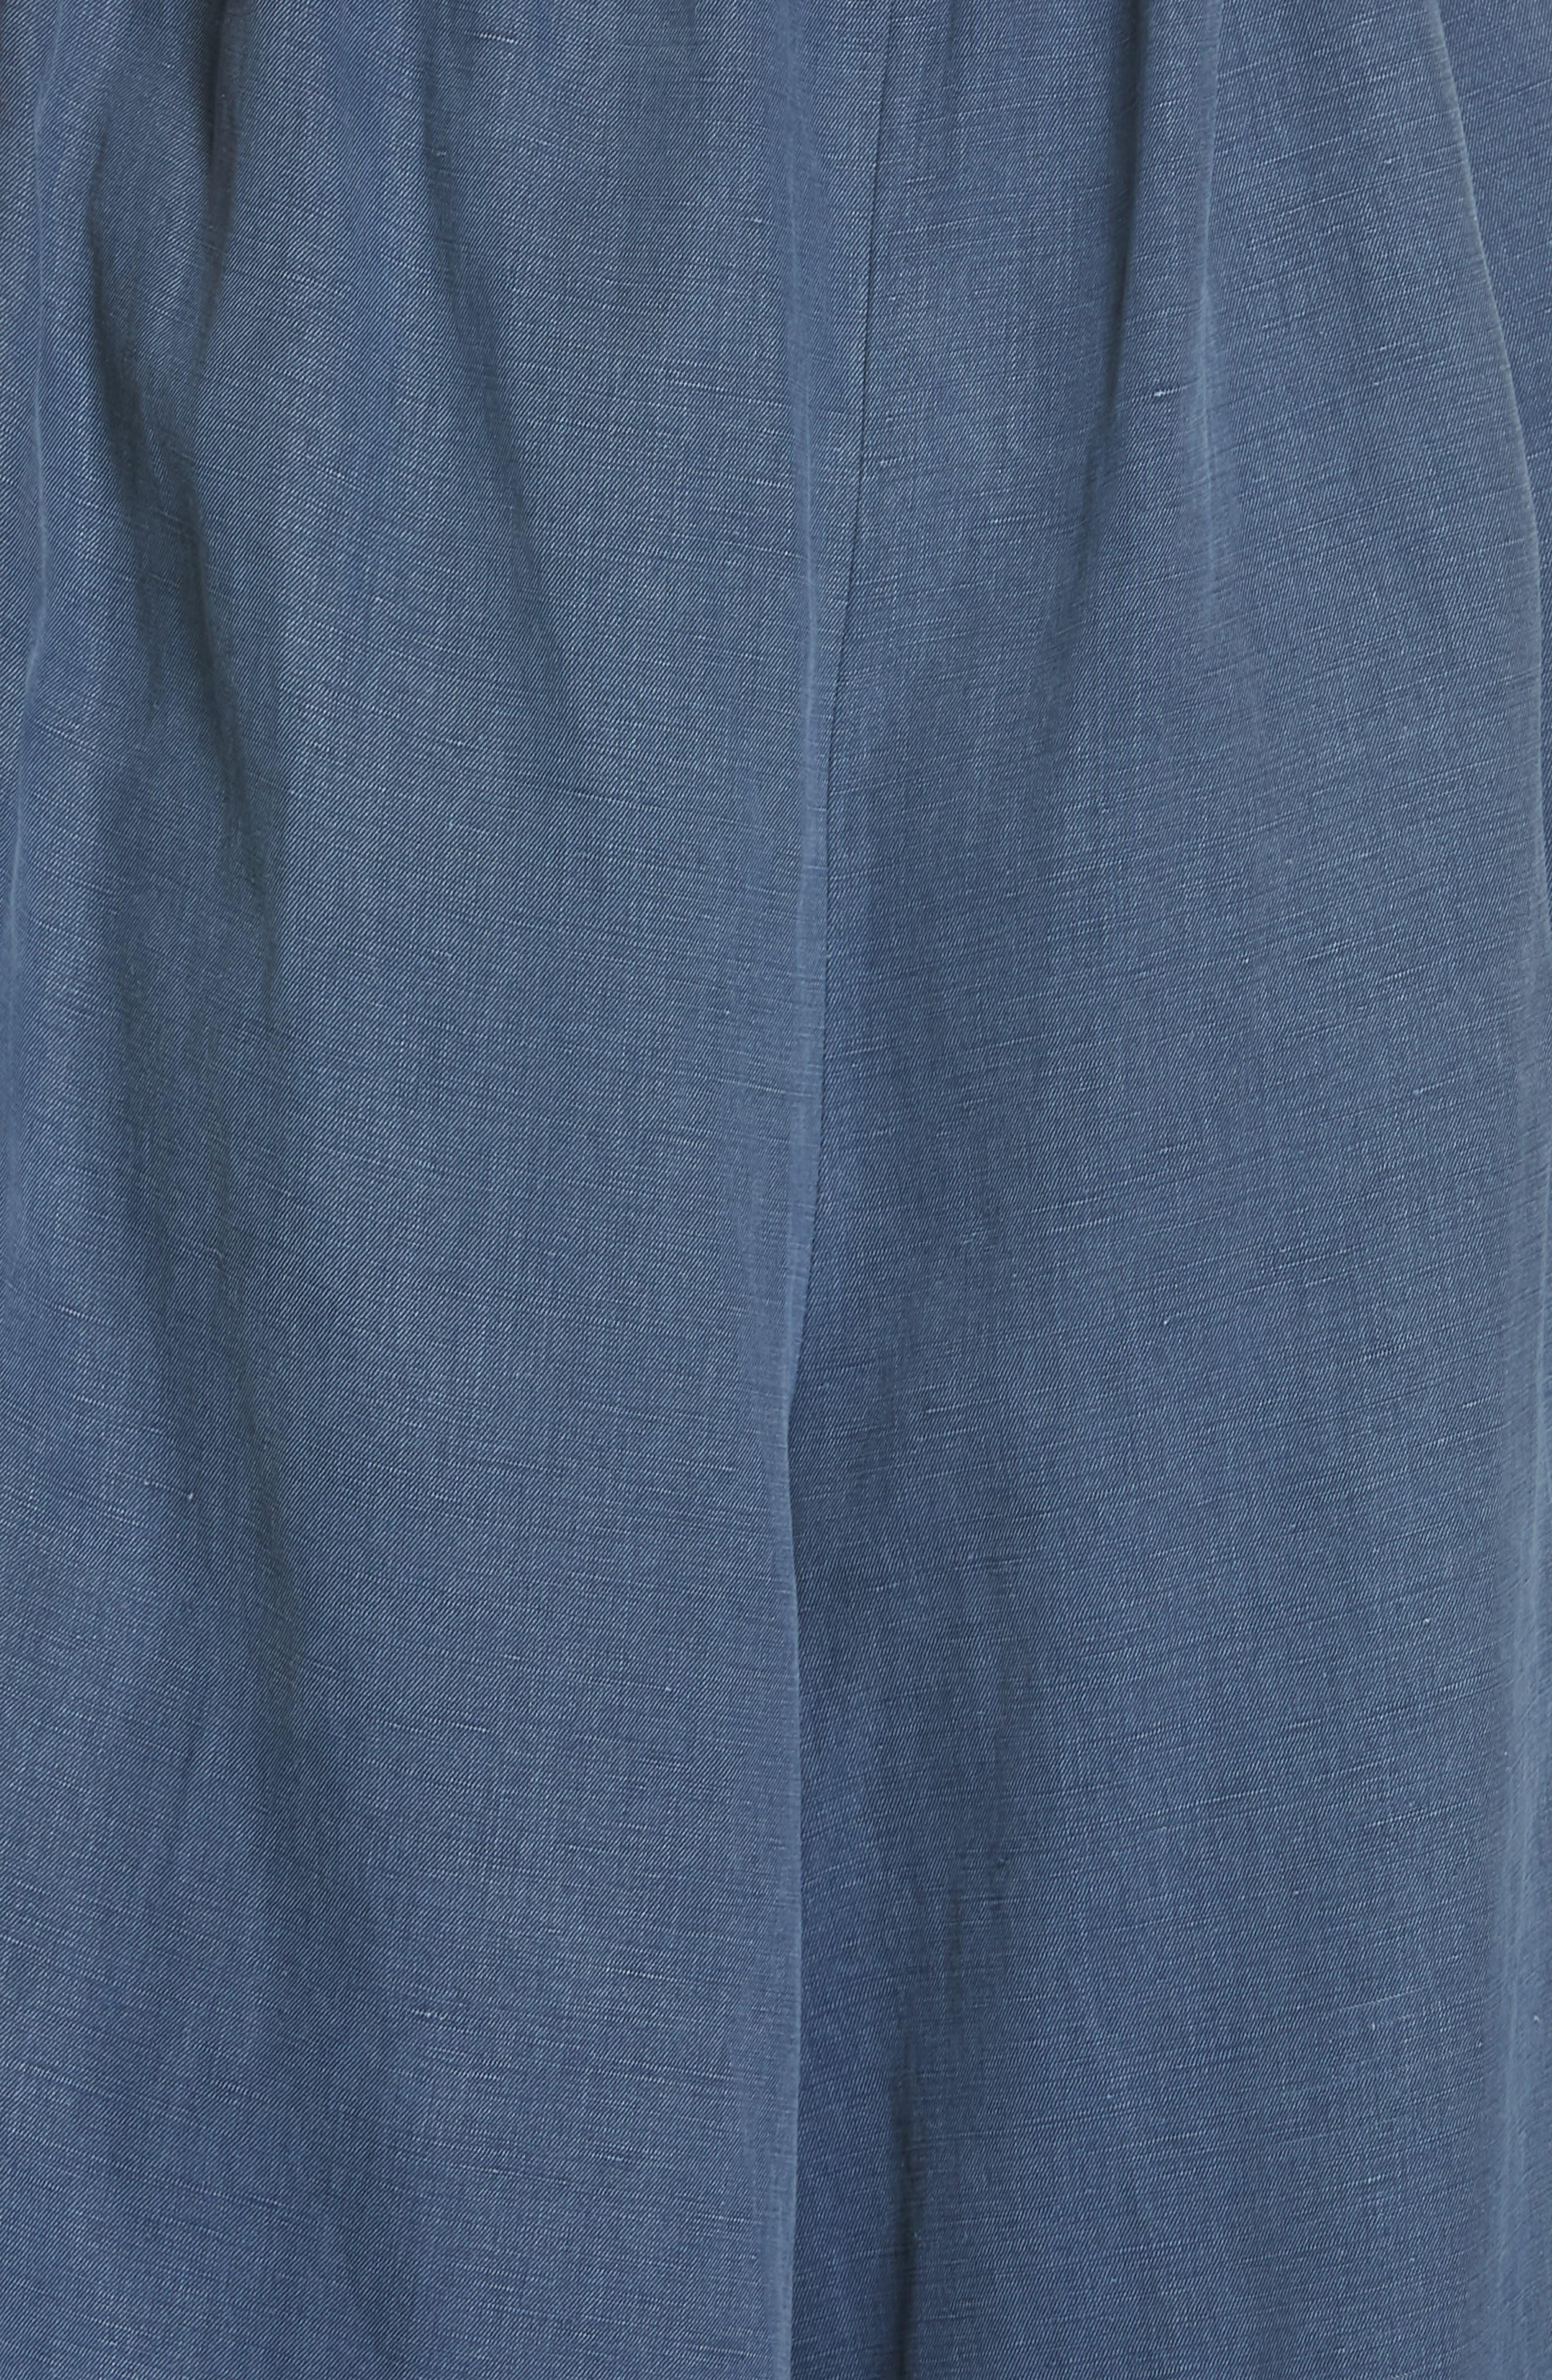 ULLA JOHNSON, Jordane Strapless Wide Leg Jumpsuit, Alternate thumbnail 5, color, CHAMBRAY